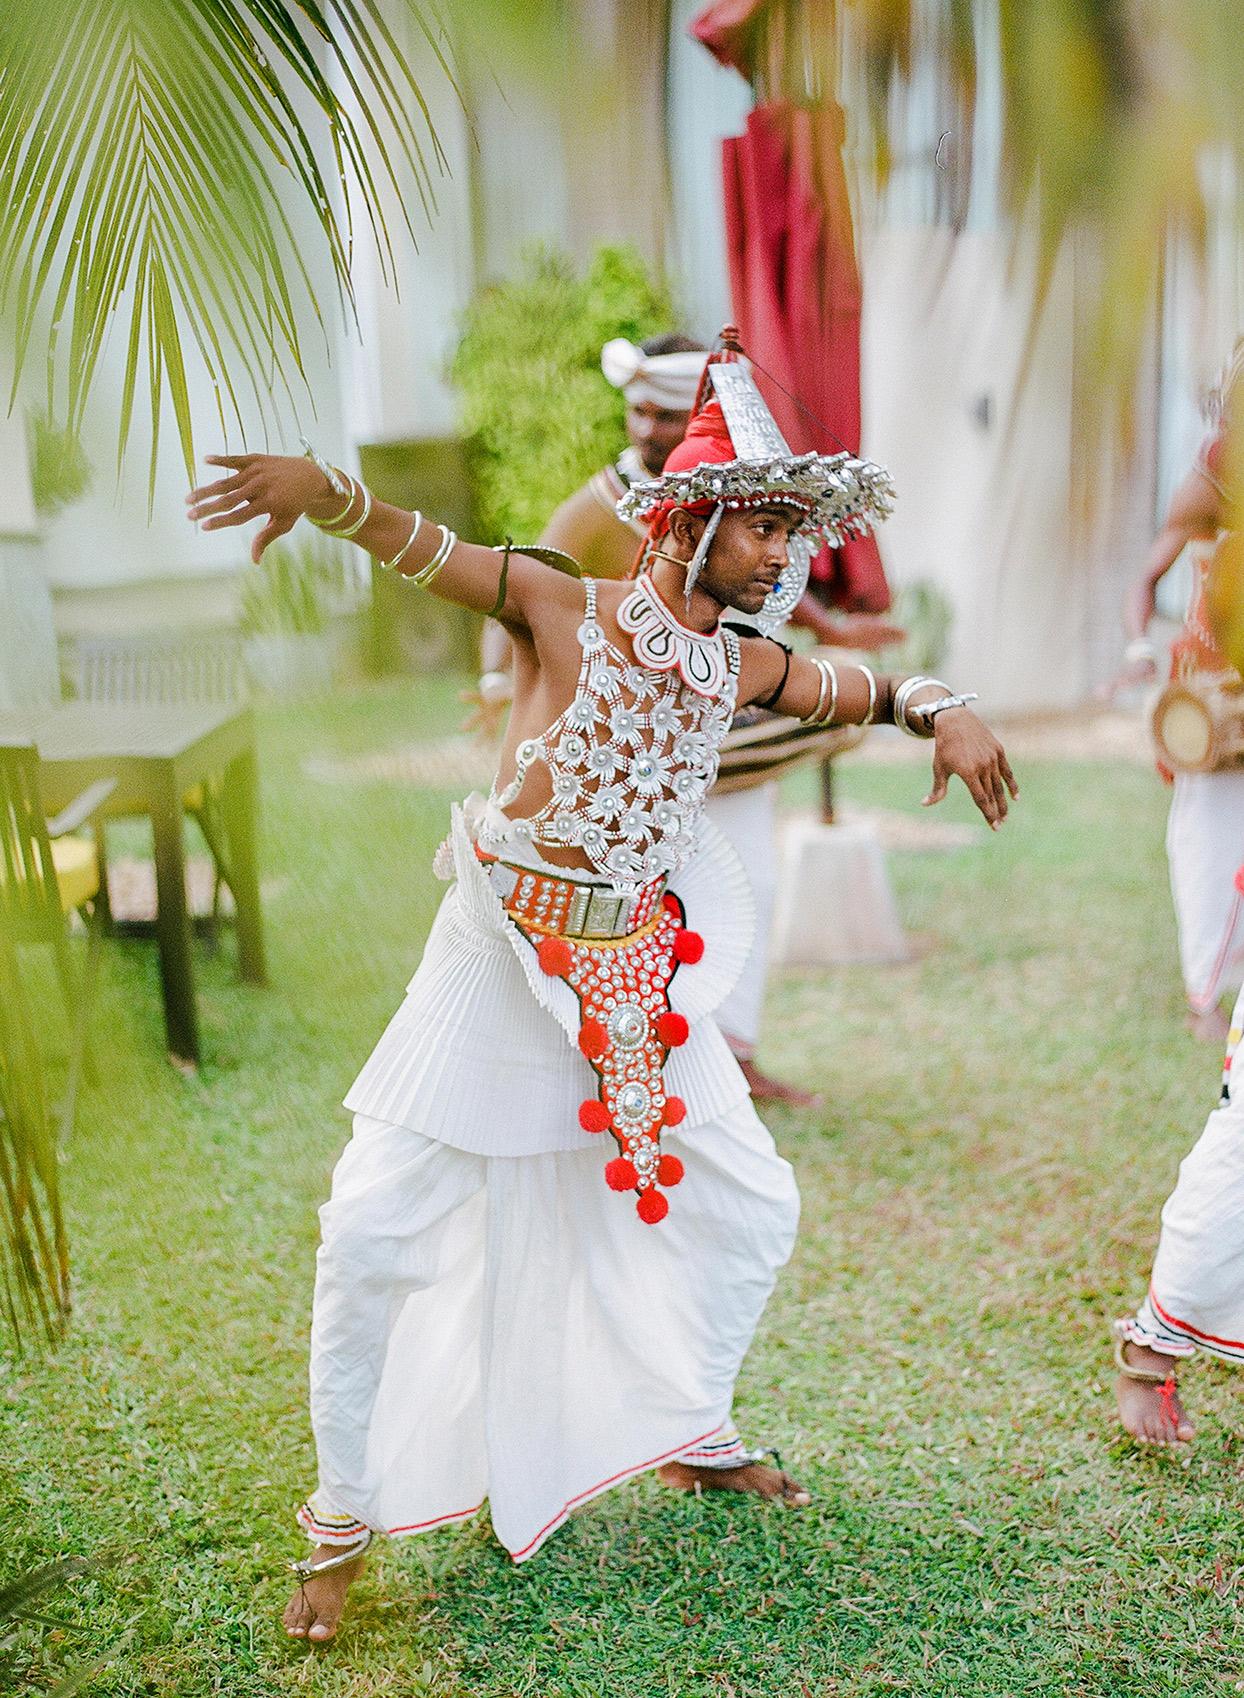 kelly sanjiv wedding dancer in grass